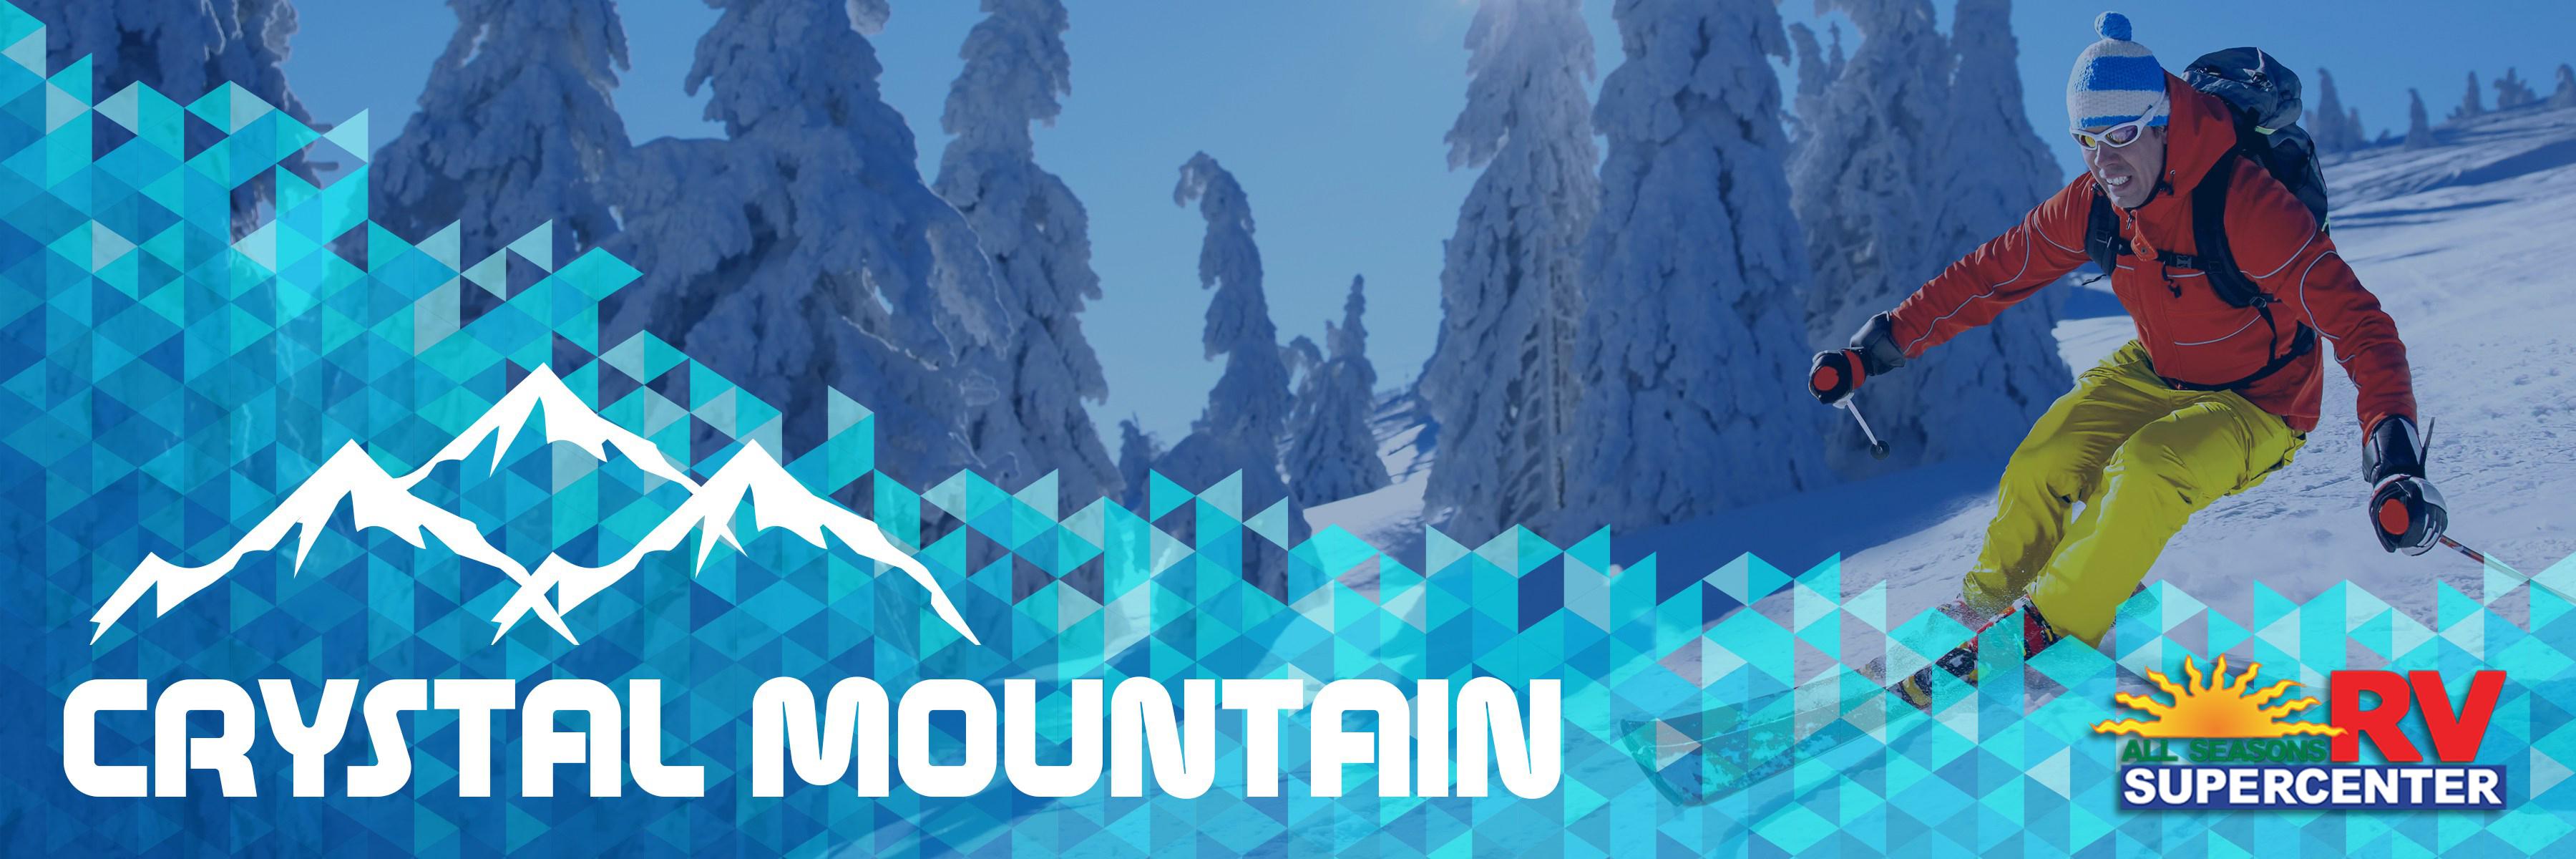 Man skiing down Crystal Mountain Banner